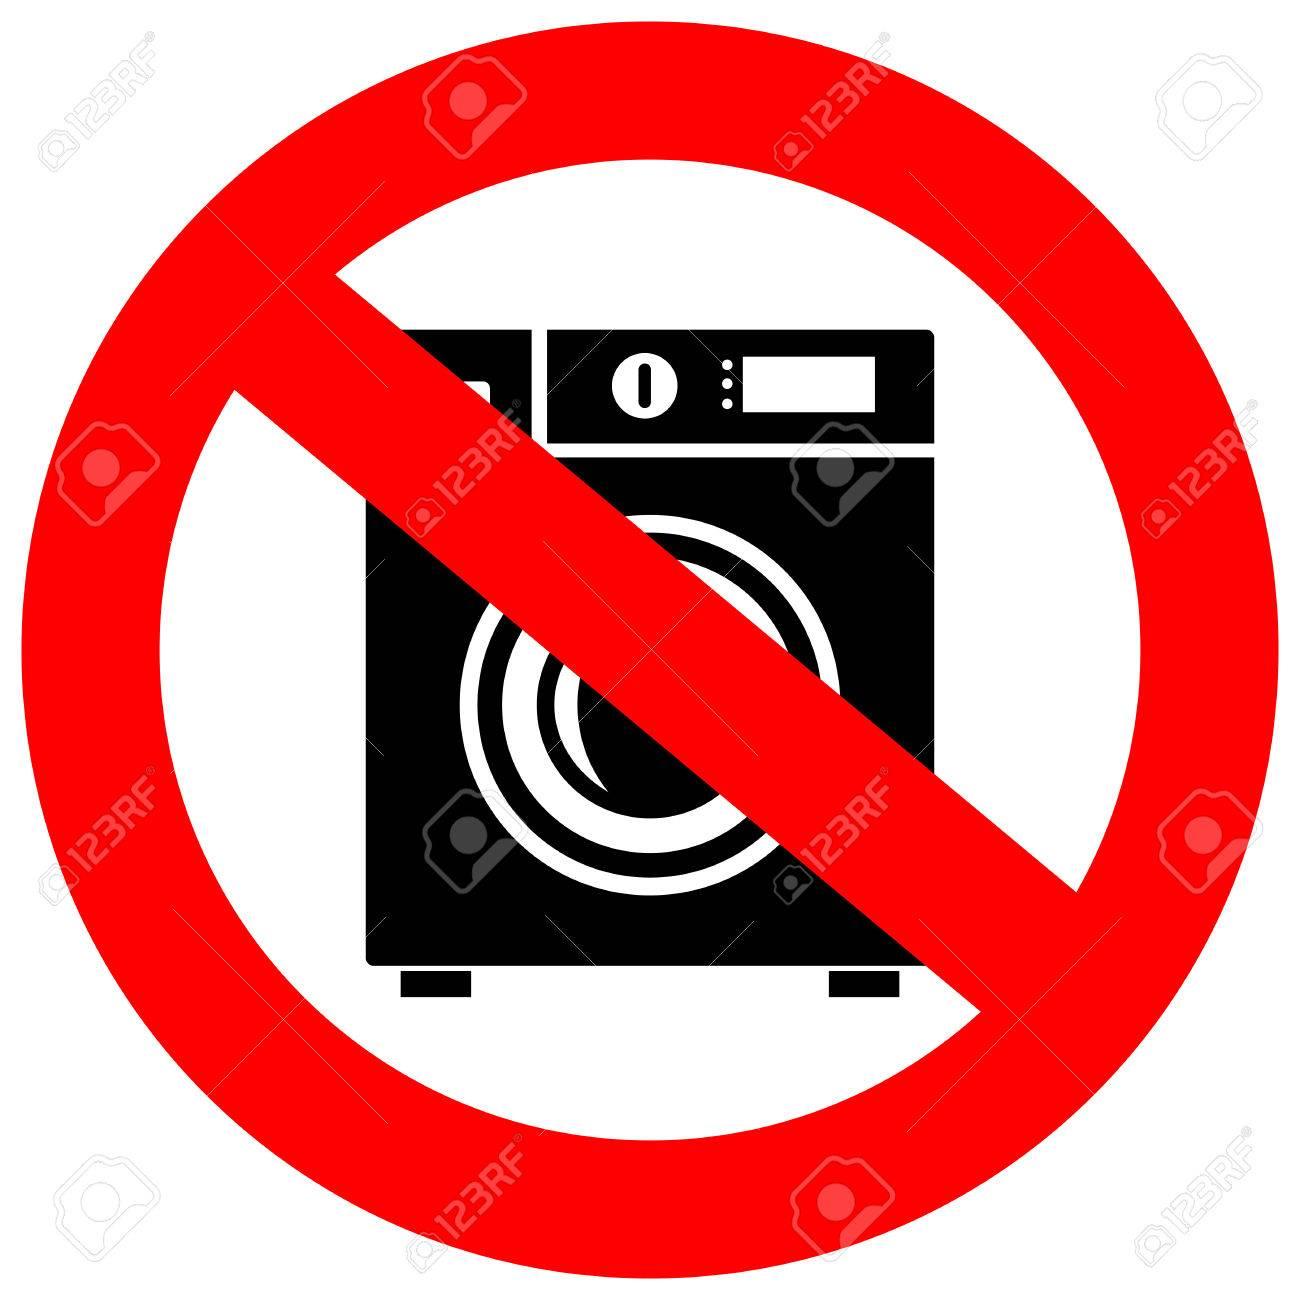 No machine wash sign royalty free cliparts vectors and stock no machine wash sign stock vector 60391431 biocorpaavc